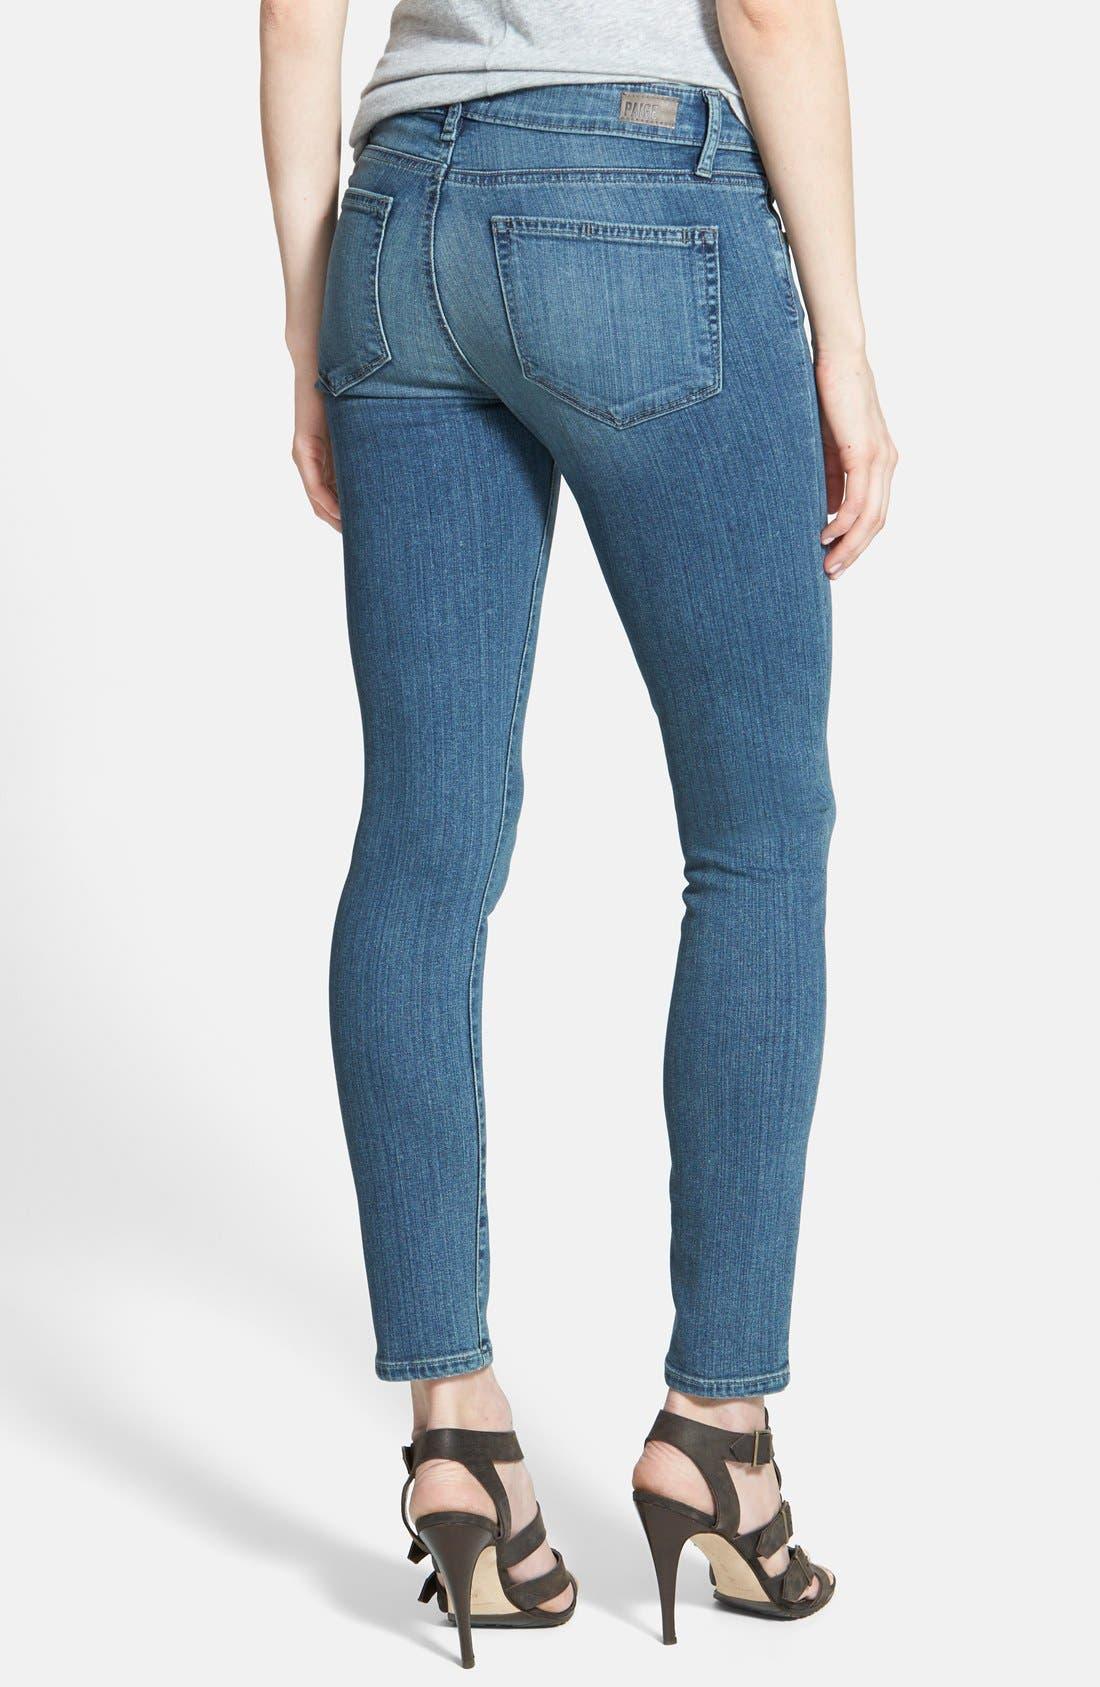 Alternate Image 2  - Paige Denim 'Verdugo' Low Rise Ankle Skinny Jeans (Dazeley)